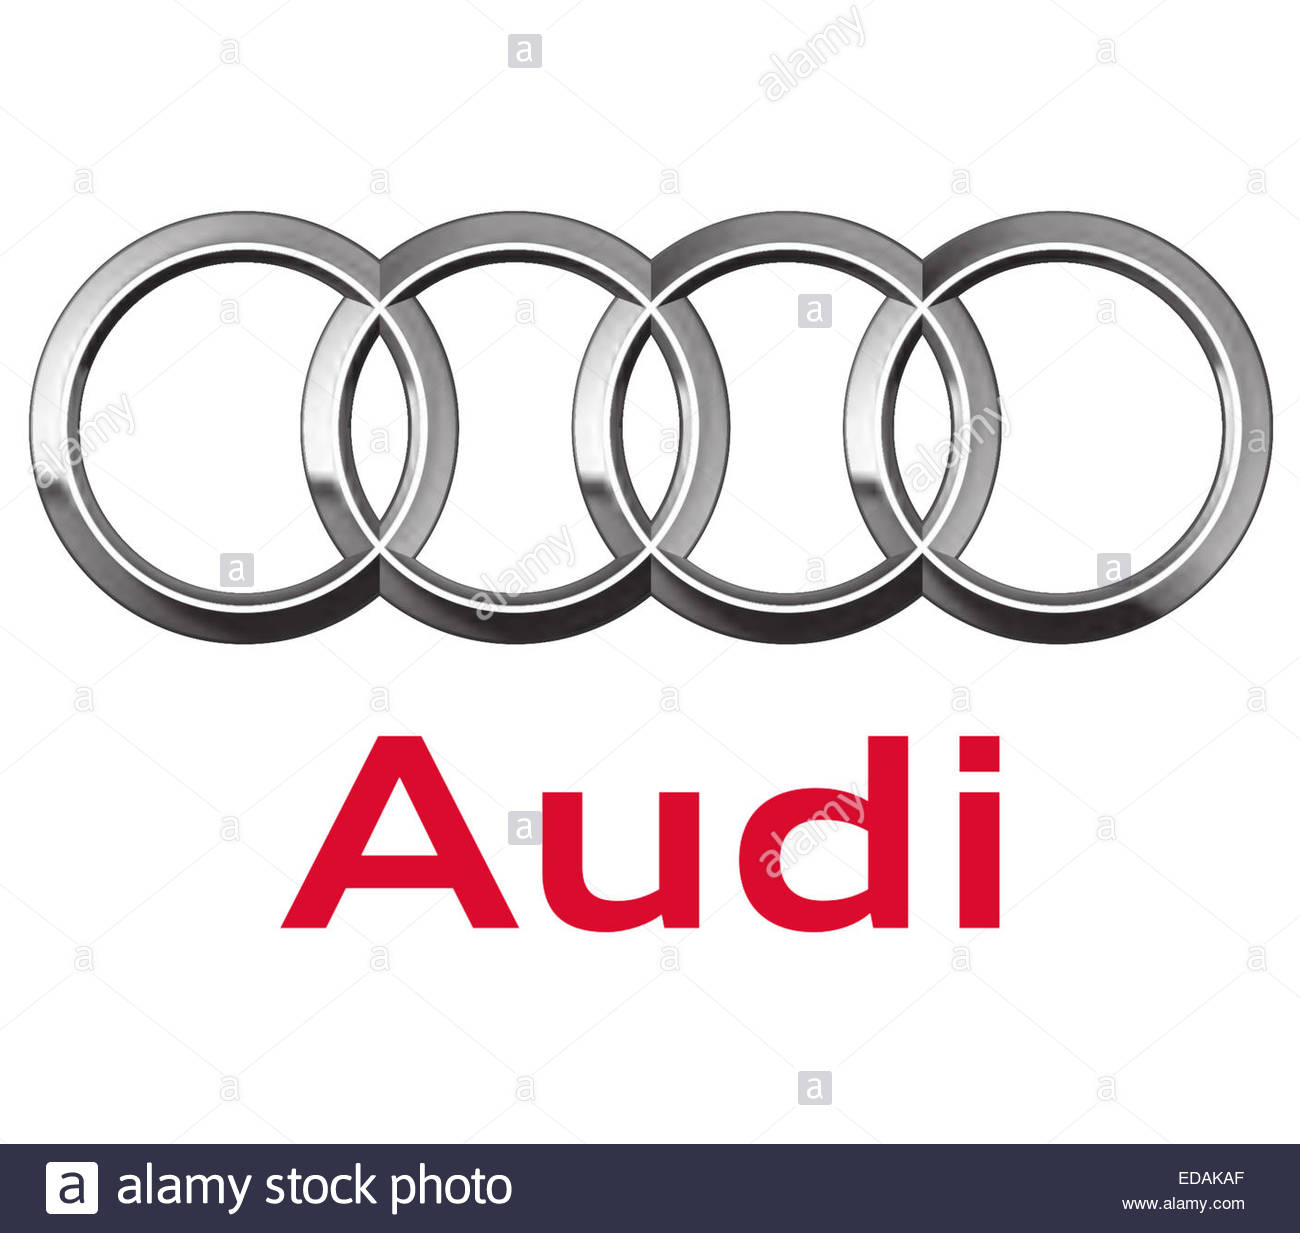 Audi Logo Icon Sign Stock Photo 77066711 Alamy